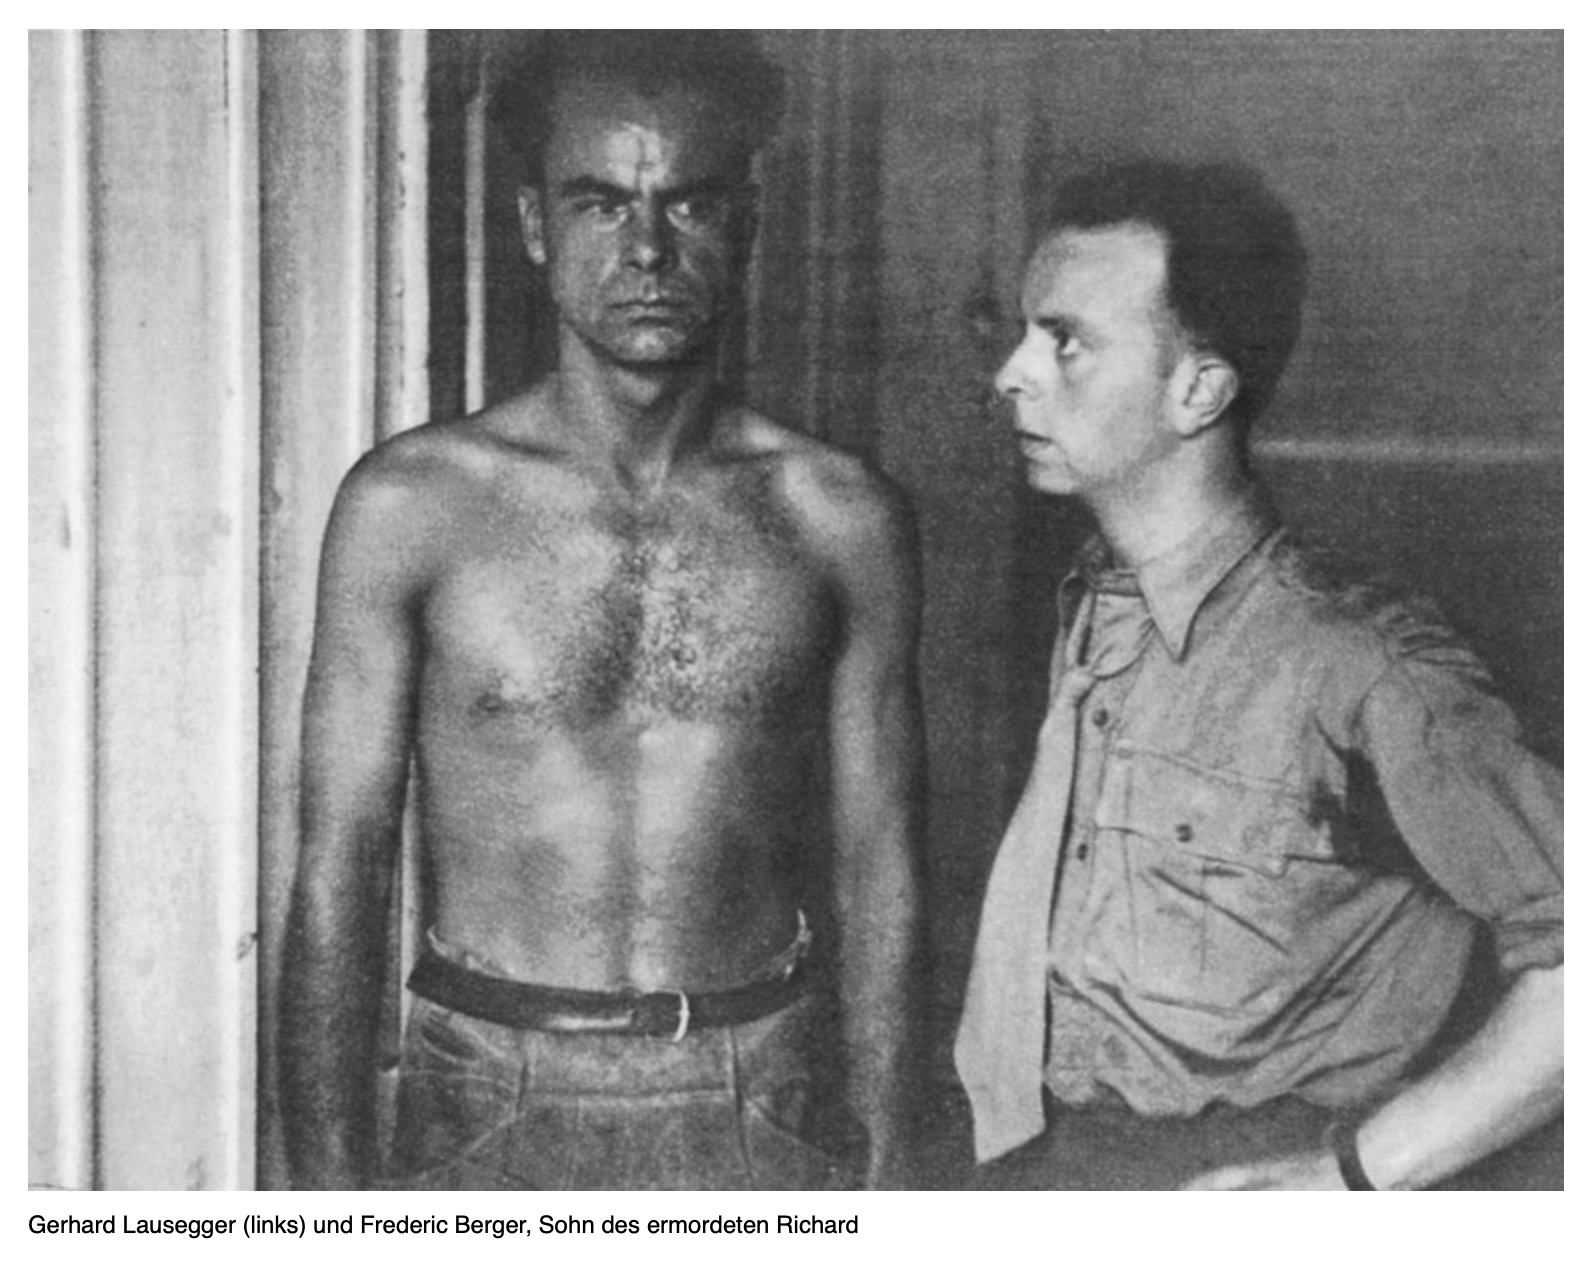 Lausegger (links) bei seiner Festnahme; rechts der Sohn des ermordeten Richard Berger (Foto: erinnern.at)